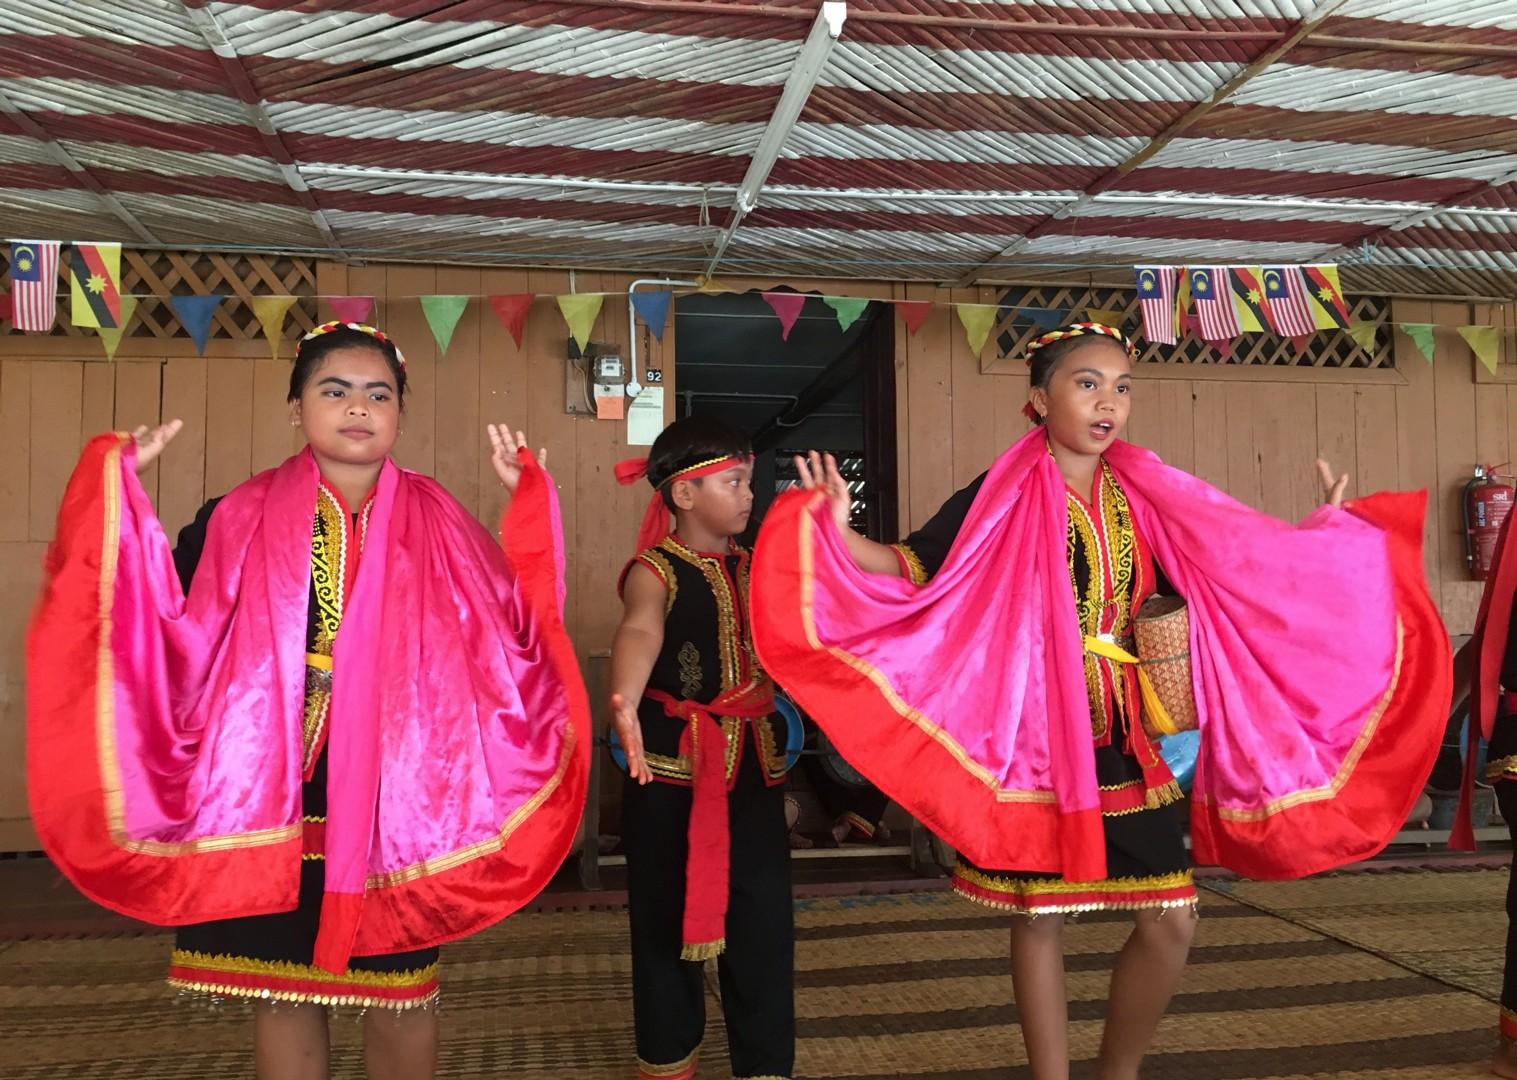 indonesia-dance-borneo-cultural-adventure-holiday.jpg - NEW! Borneo - Secret Sarawak - Cycling Adventures